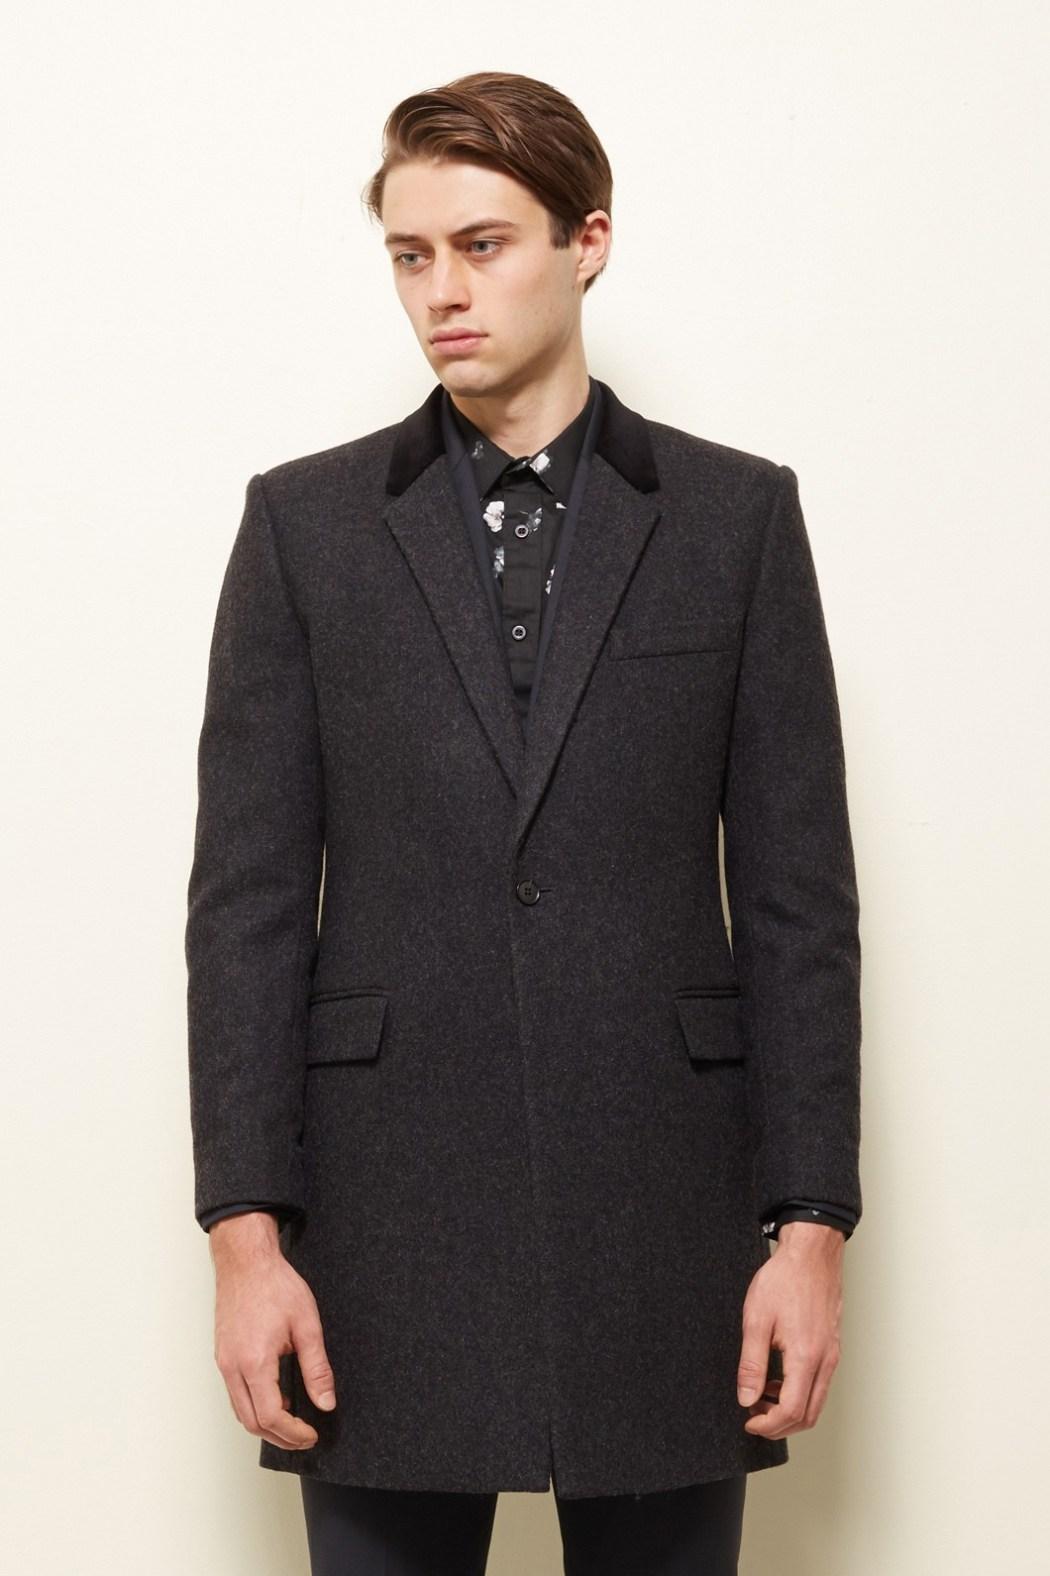 cappotto_chesterfield_coat_men4